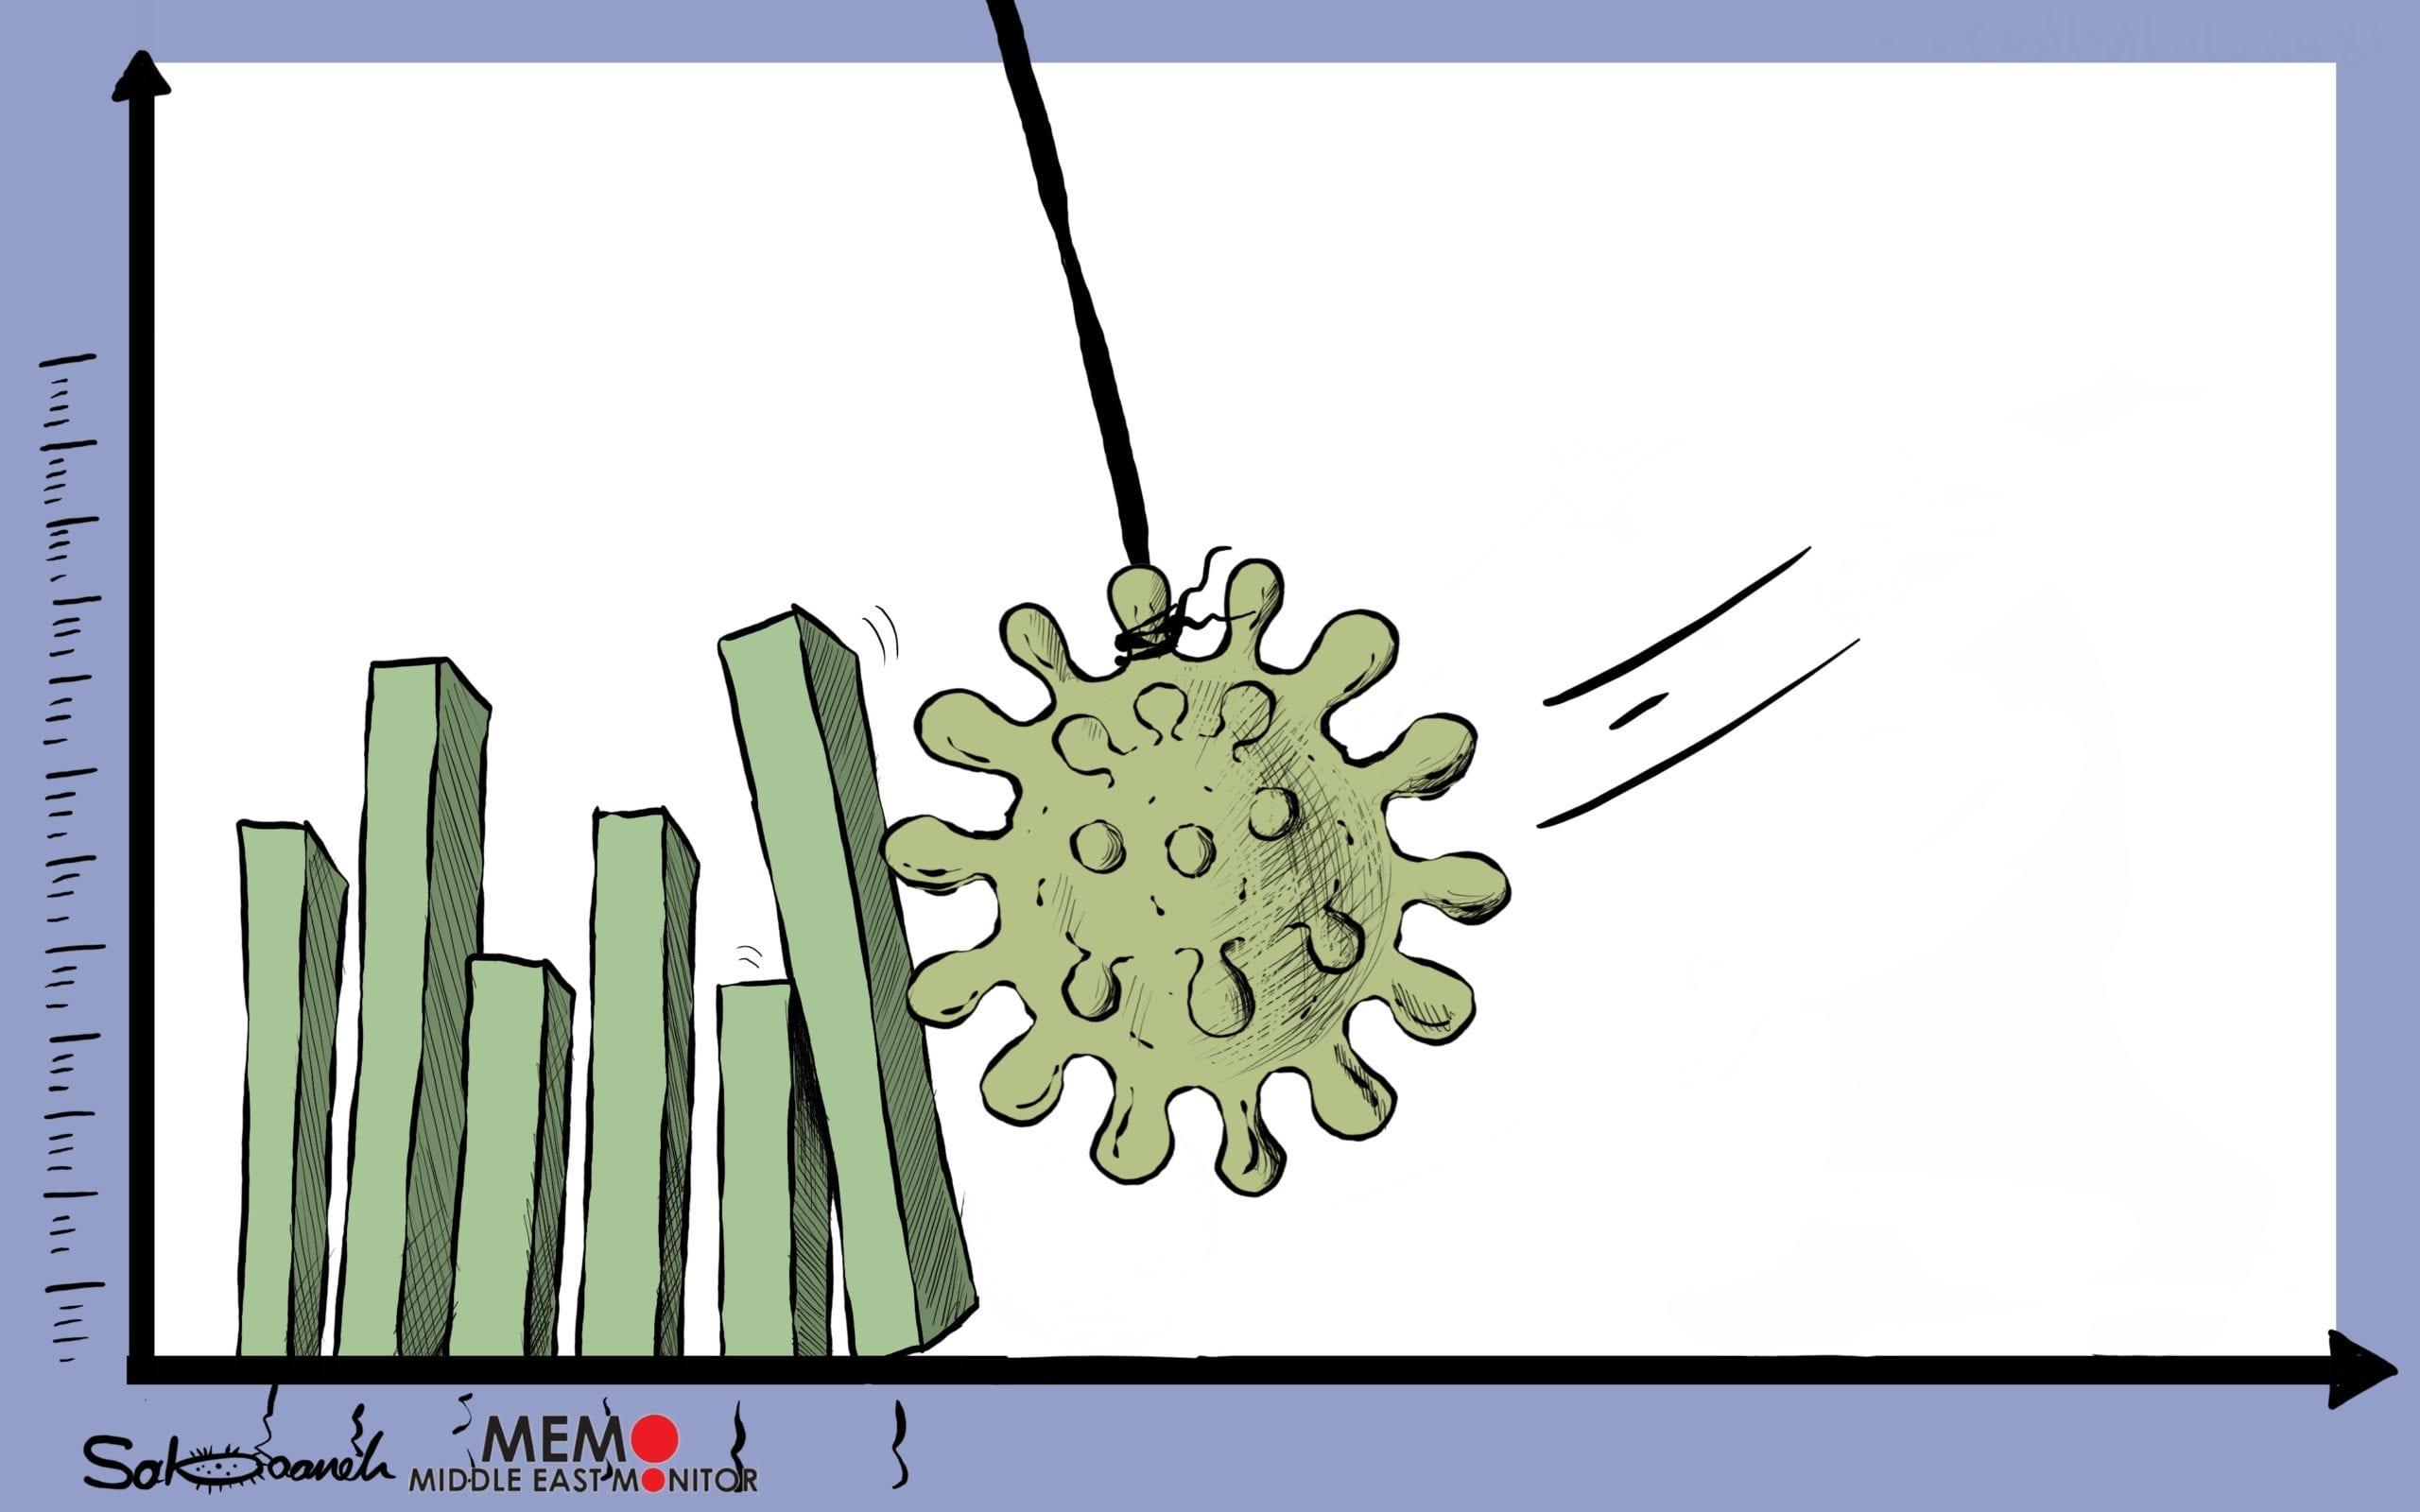 Coronavirus is affecting the world's economy - Cartoon [Sabaaneh/MiddleEastMonitor]